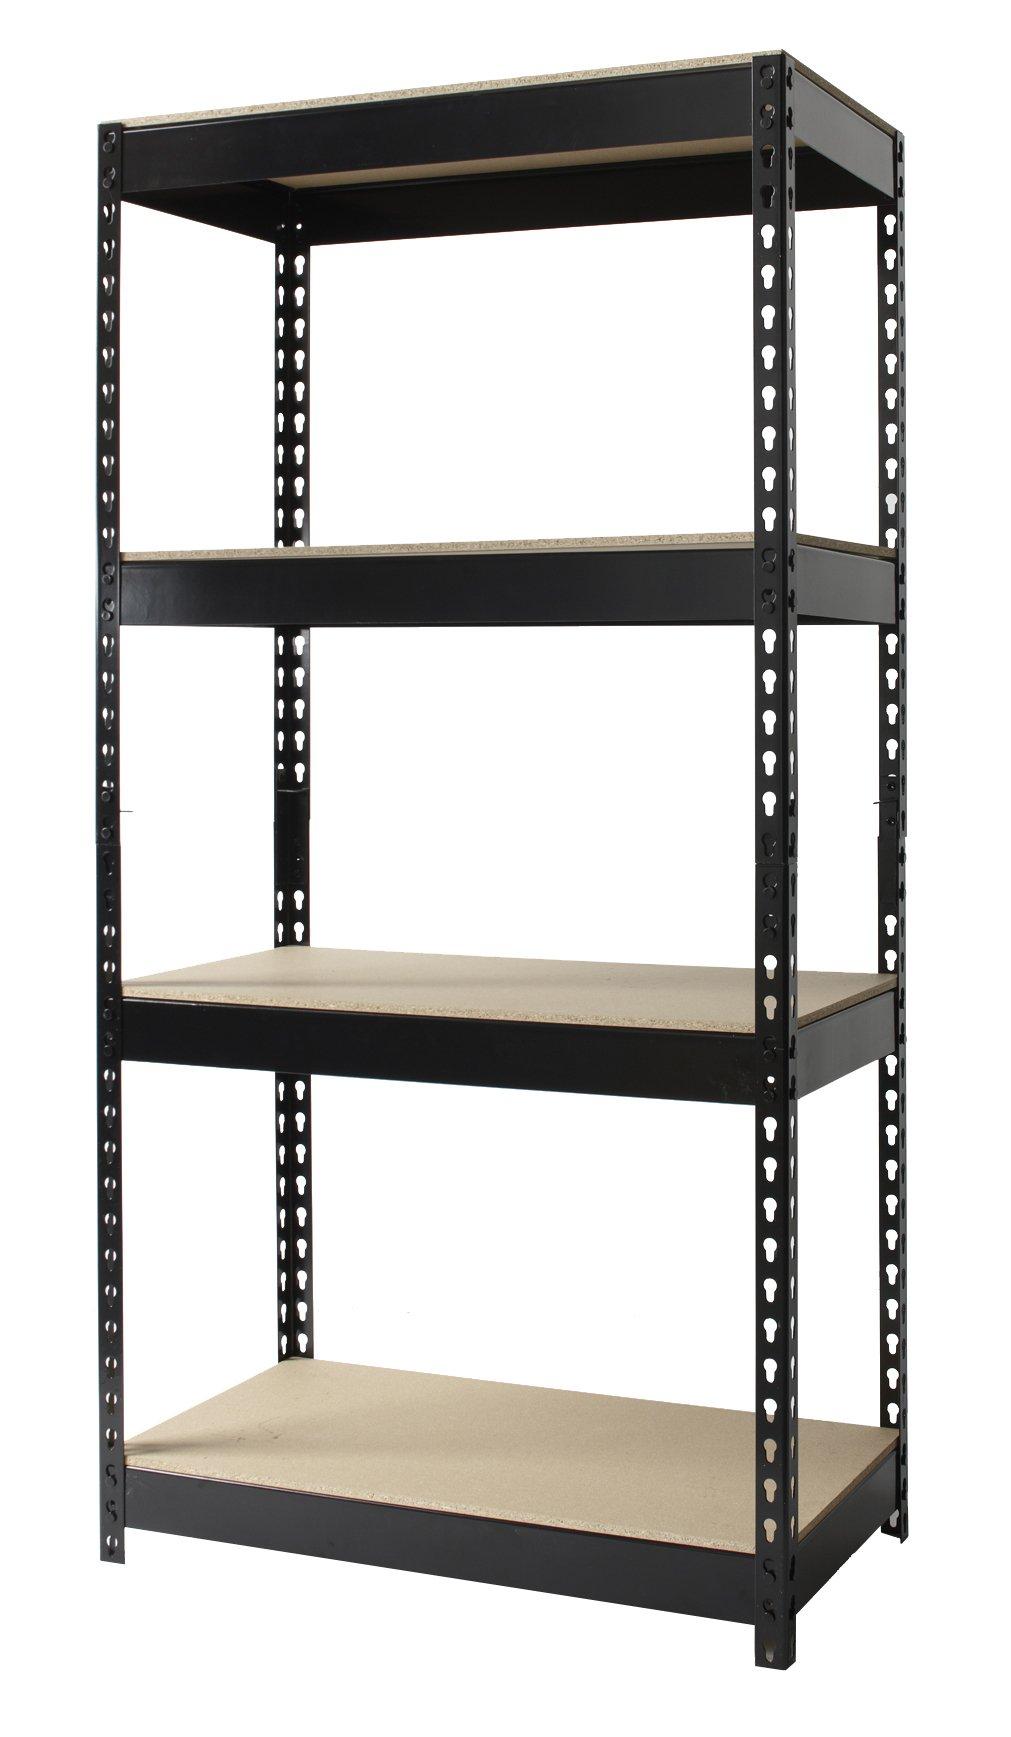 Hirsh Industries Office Dimensions Riveted Steel Shelving 4-Shelf Unit, 30'' W x 16'' D x 60'' H, Black